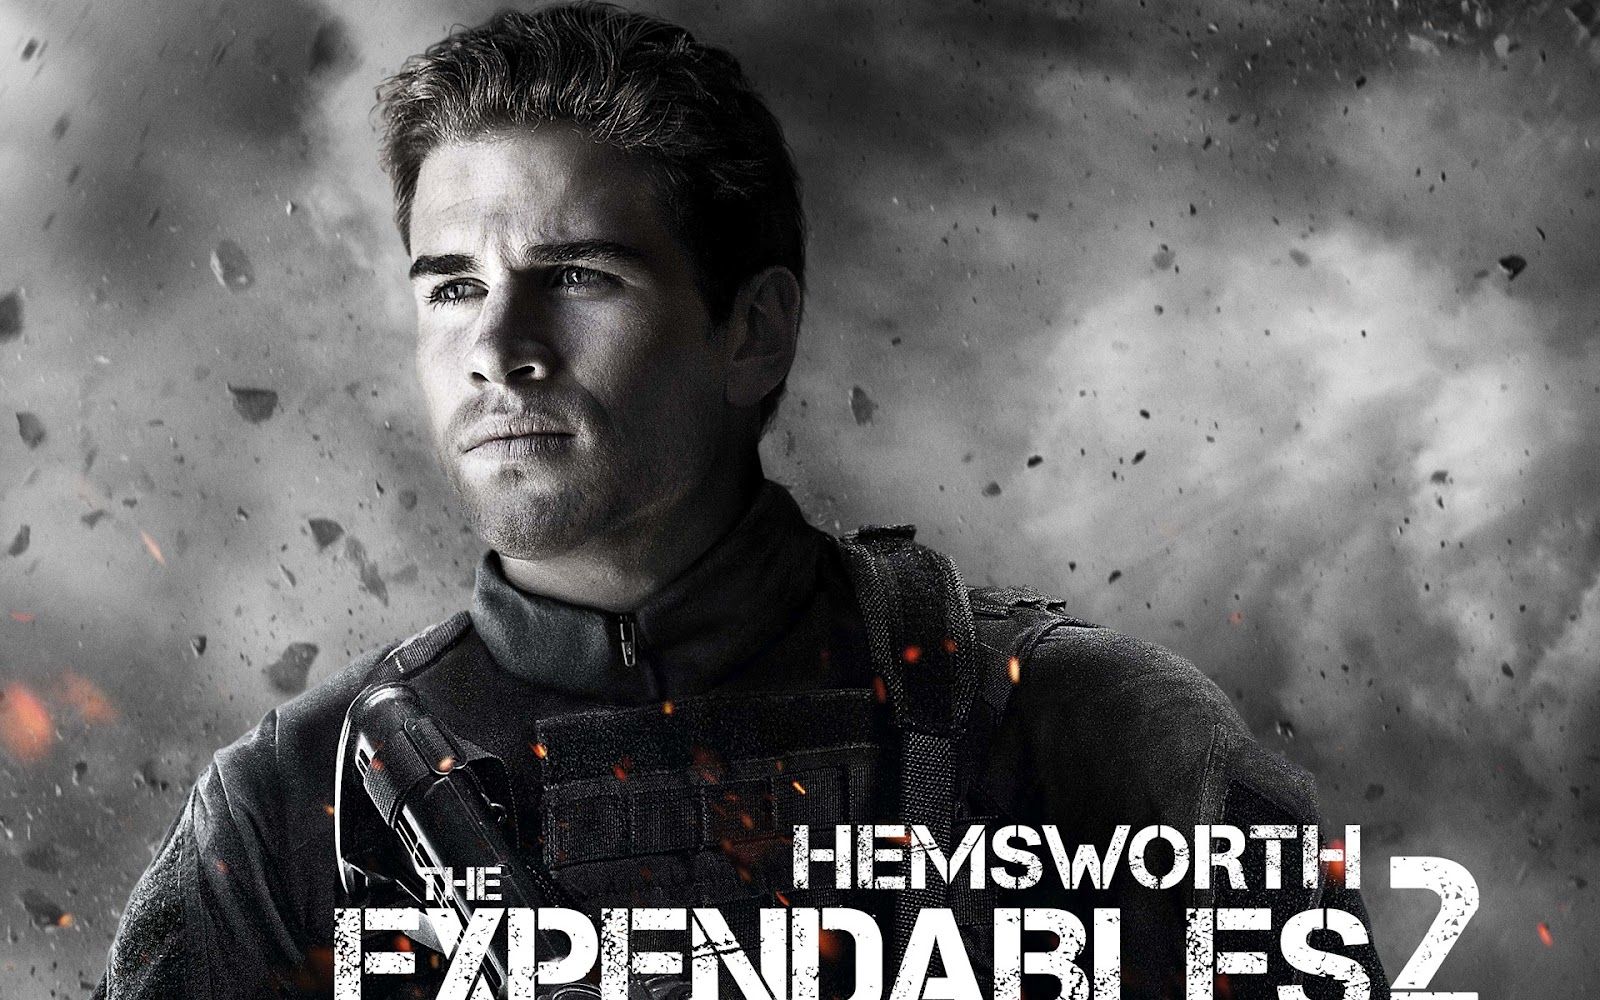 http://1.bp.blogspot.com/-njoWsMszTNI/T8jBPwohCpI/AAAAAAAADFE/akCAieP1358/s1600/Liam-Hemsworth-the-Expendables-2.jpg